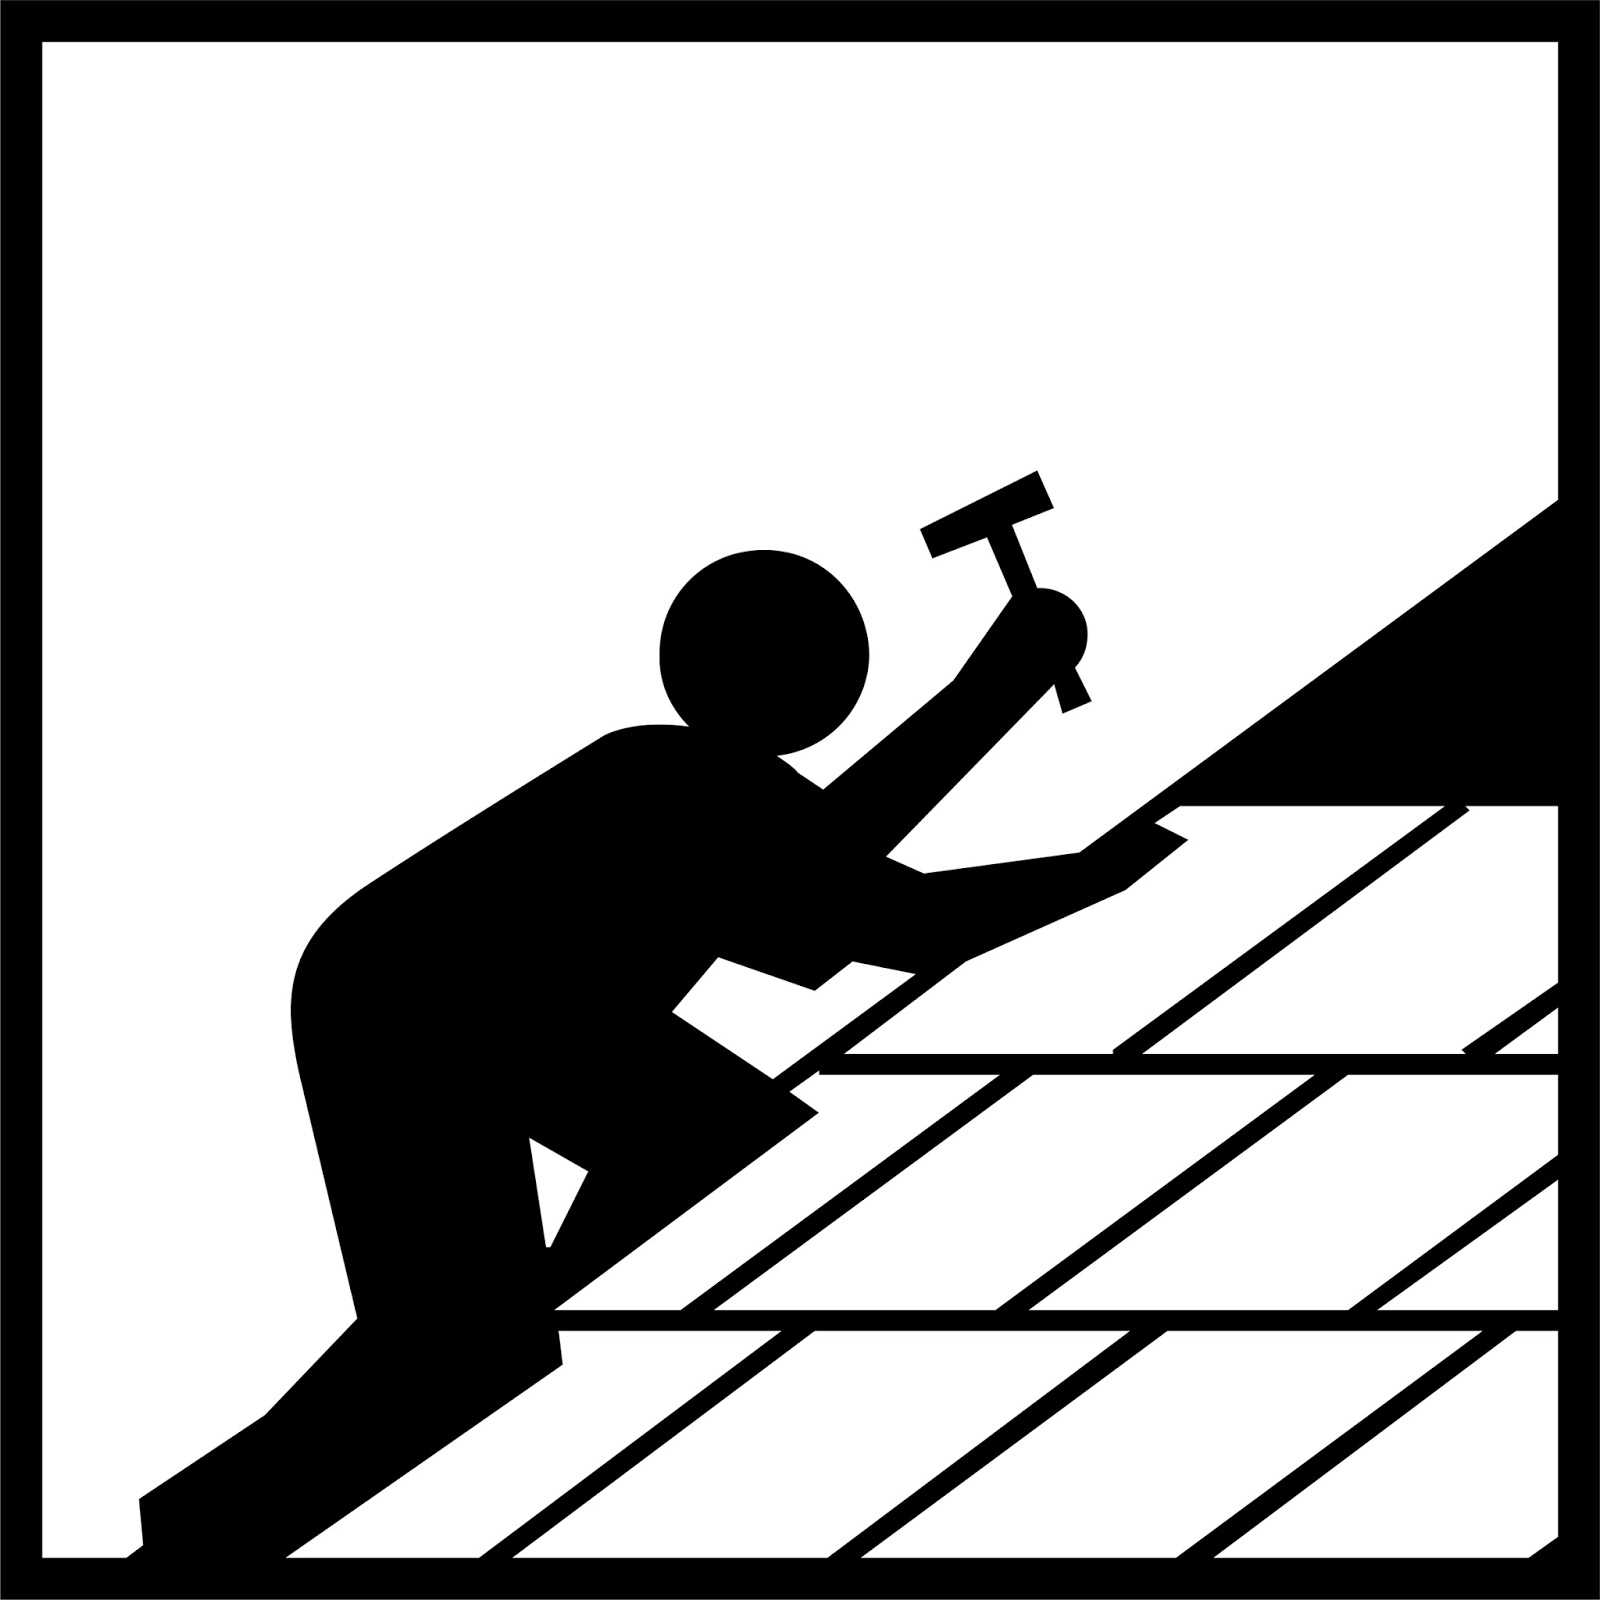 Clip Art Roof Repair Clipart.